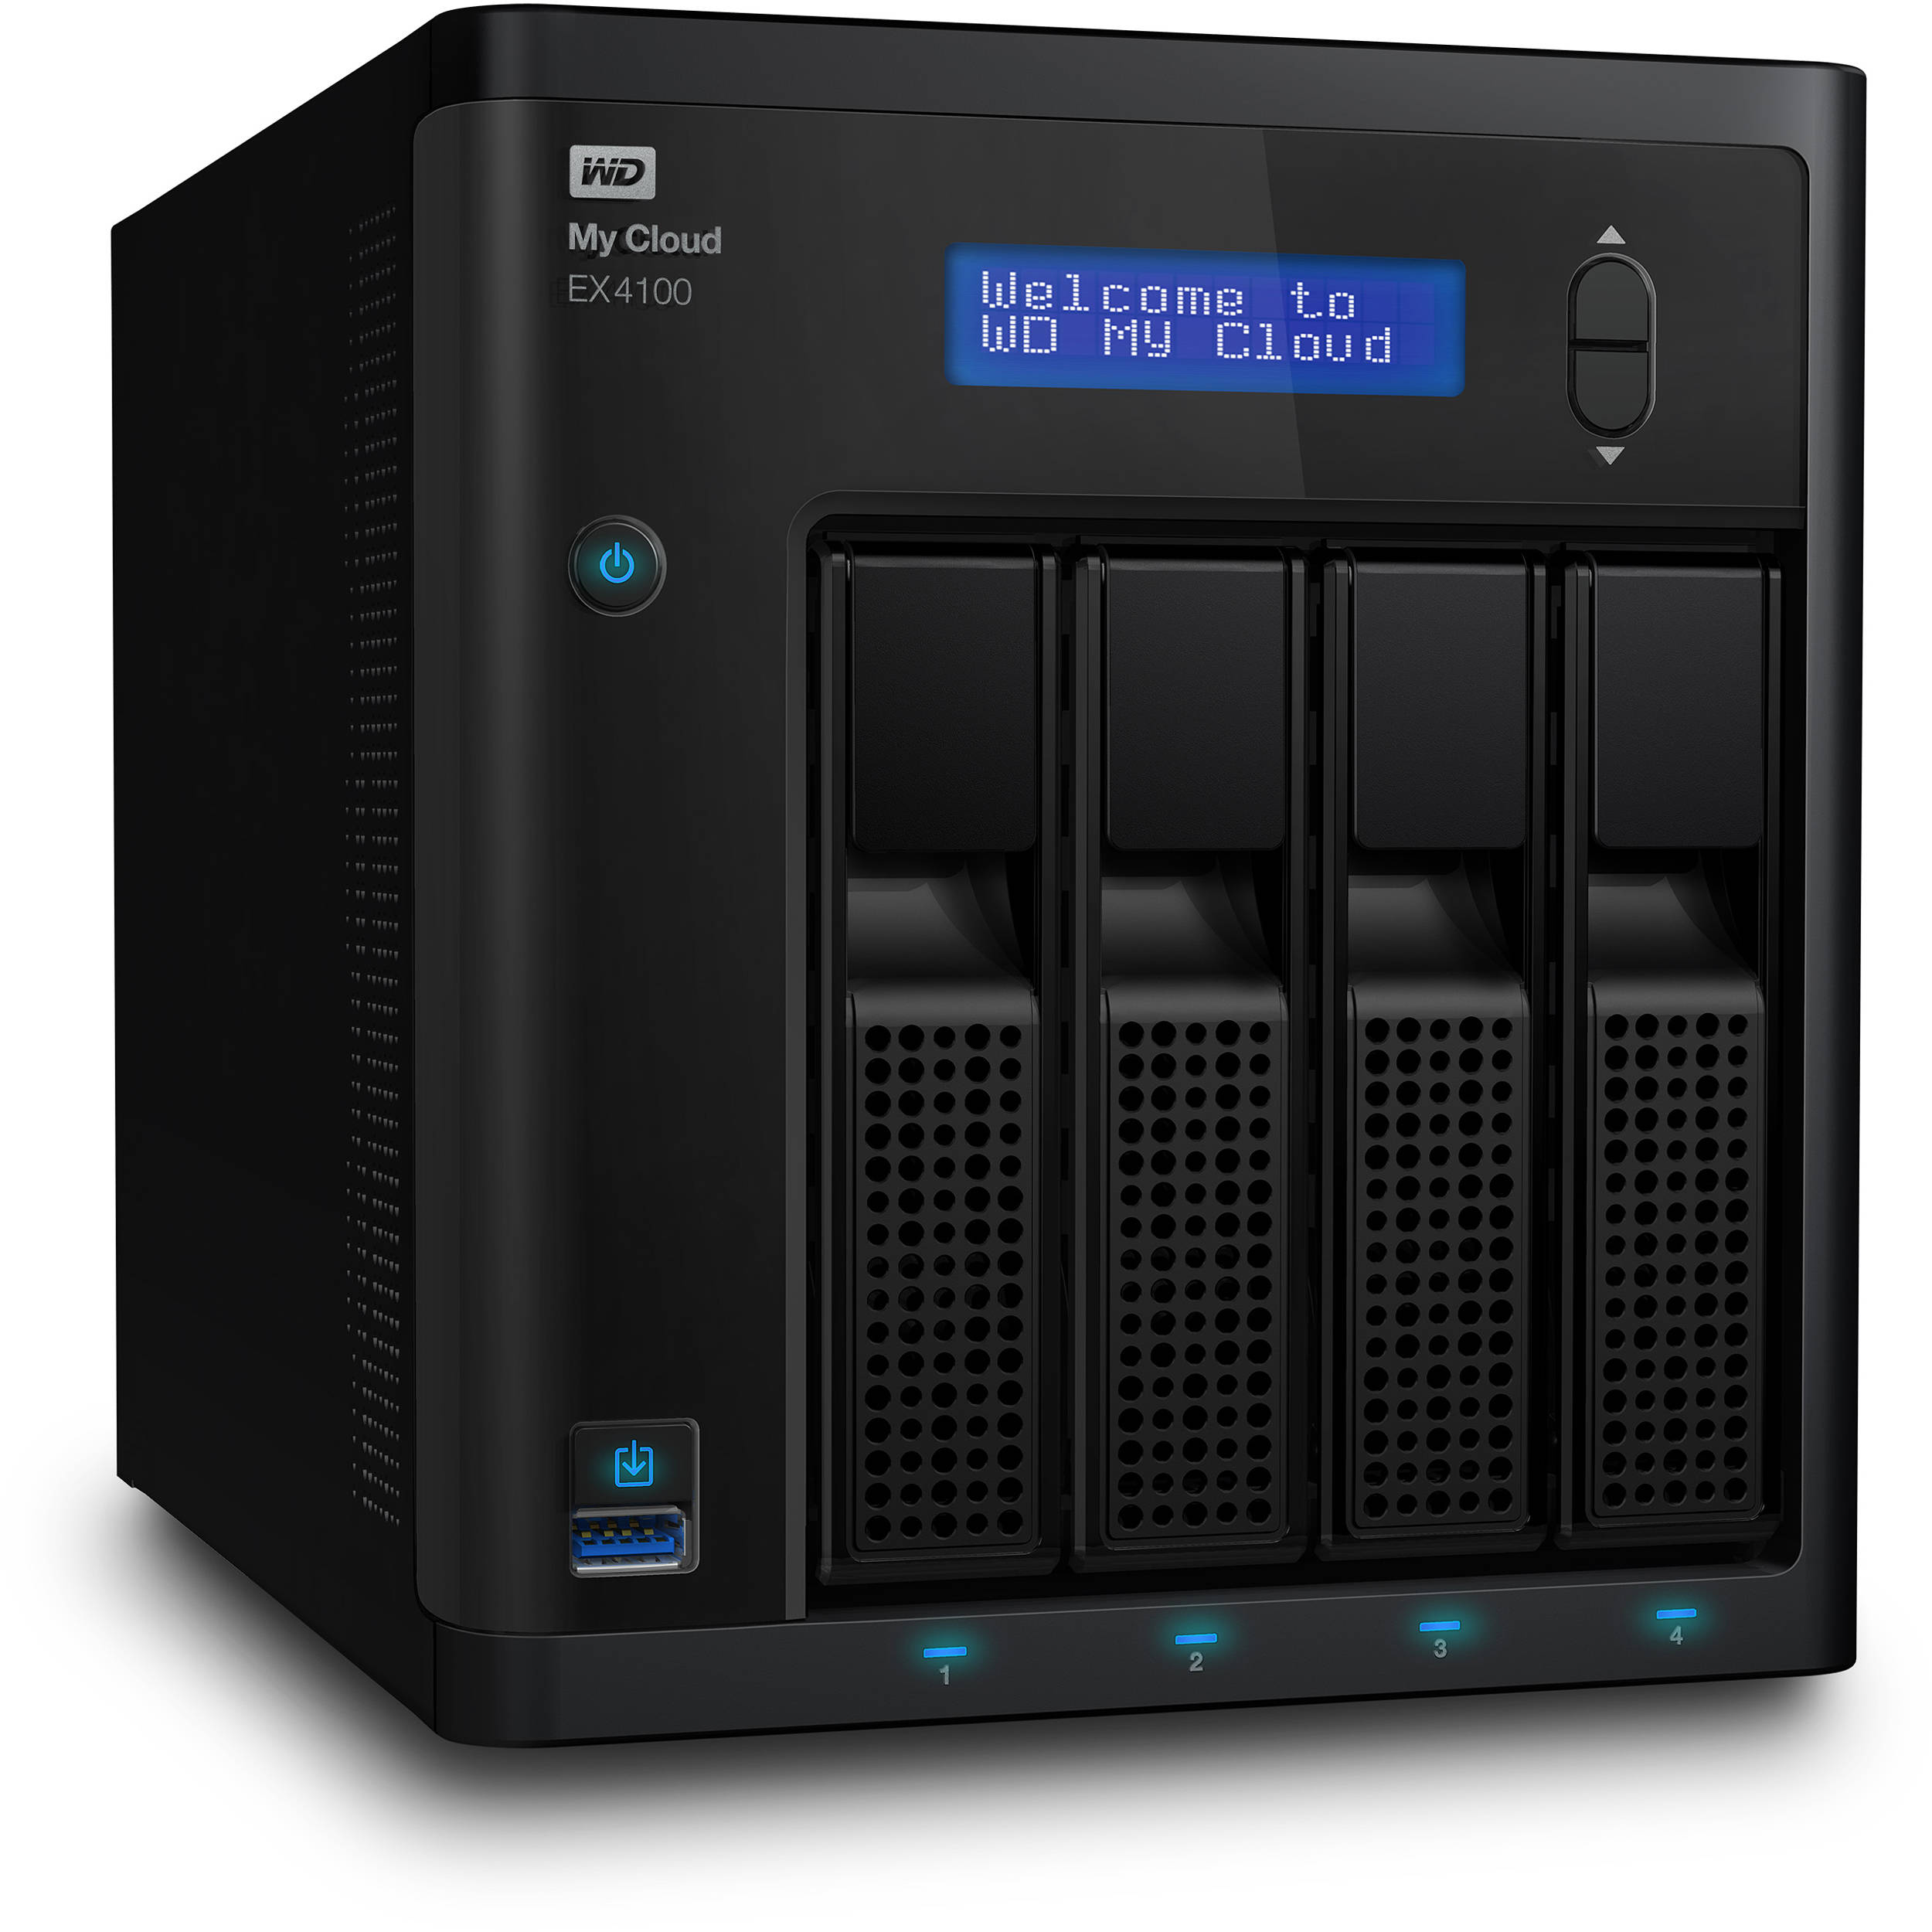 Wd 8tb 2 X 4tb My Cloud Expert Series Wdbwze0080kbk Nesn B Amp H